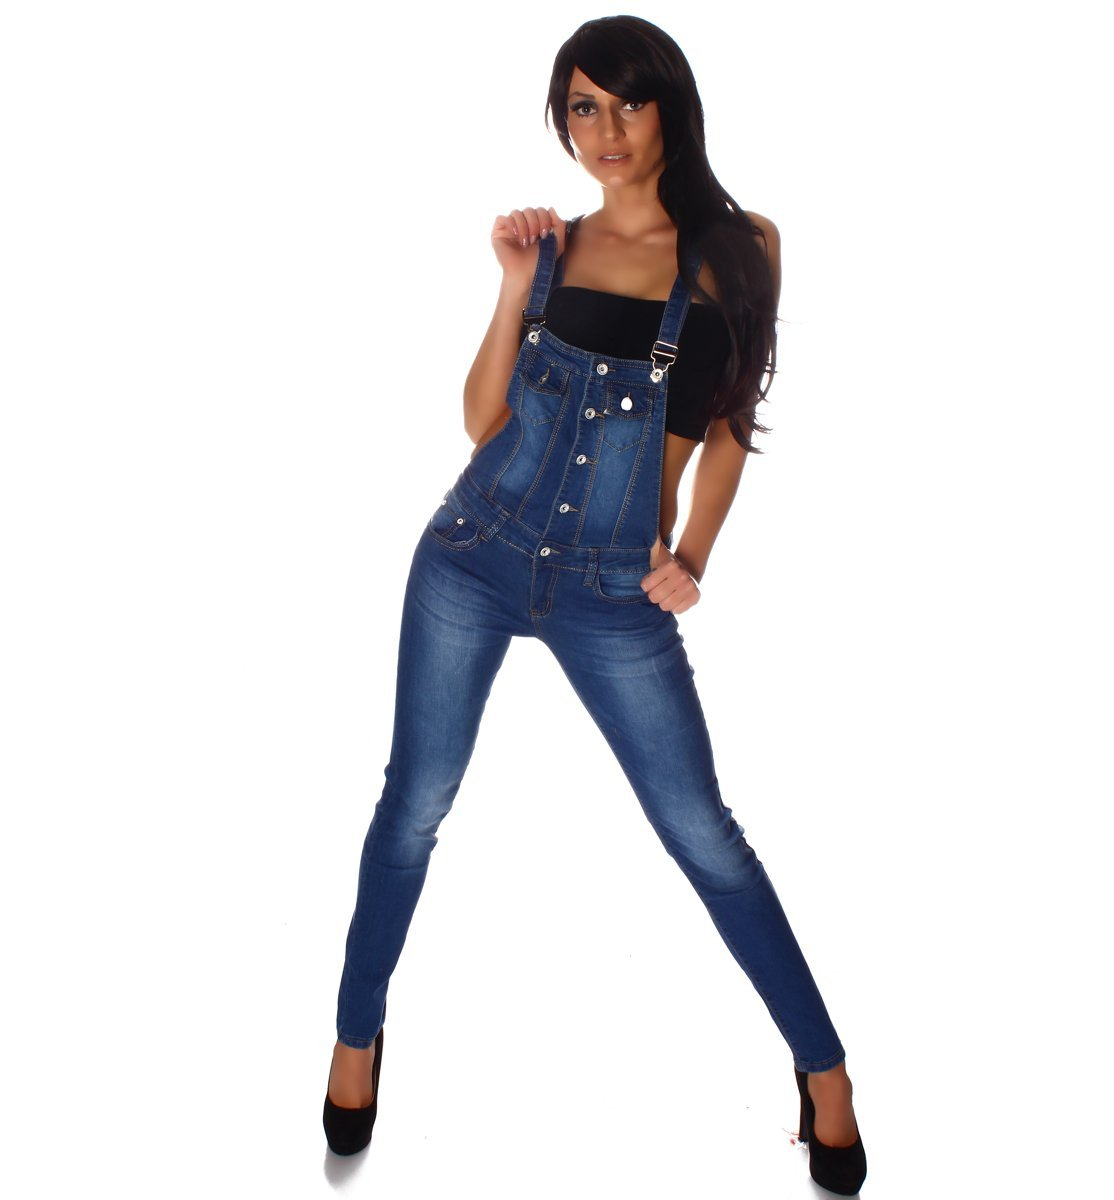 10694 Fashion4Young Damen Latzhose Hose pants mit Träger Röhren Jeans  Overall Jeanshose Trägerhose ab3511f1bb